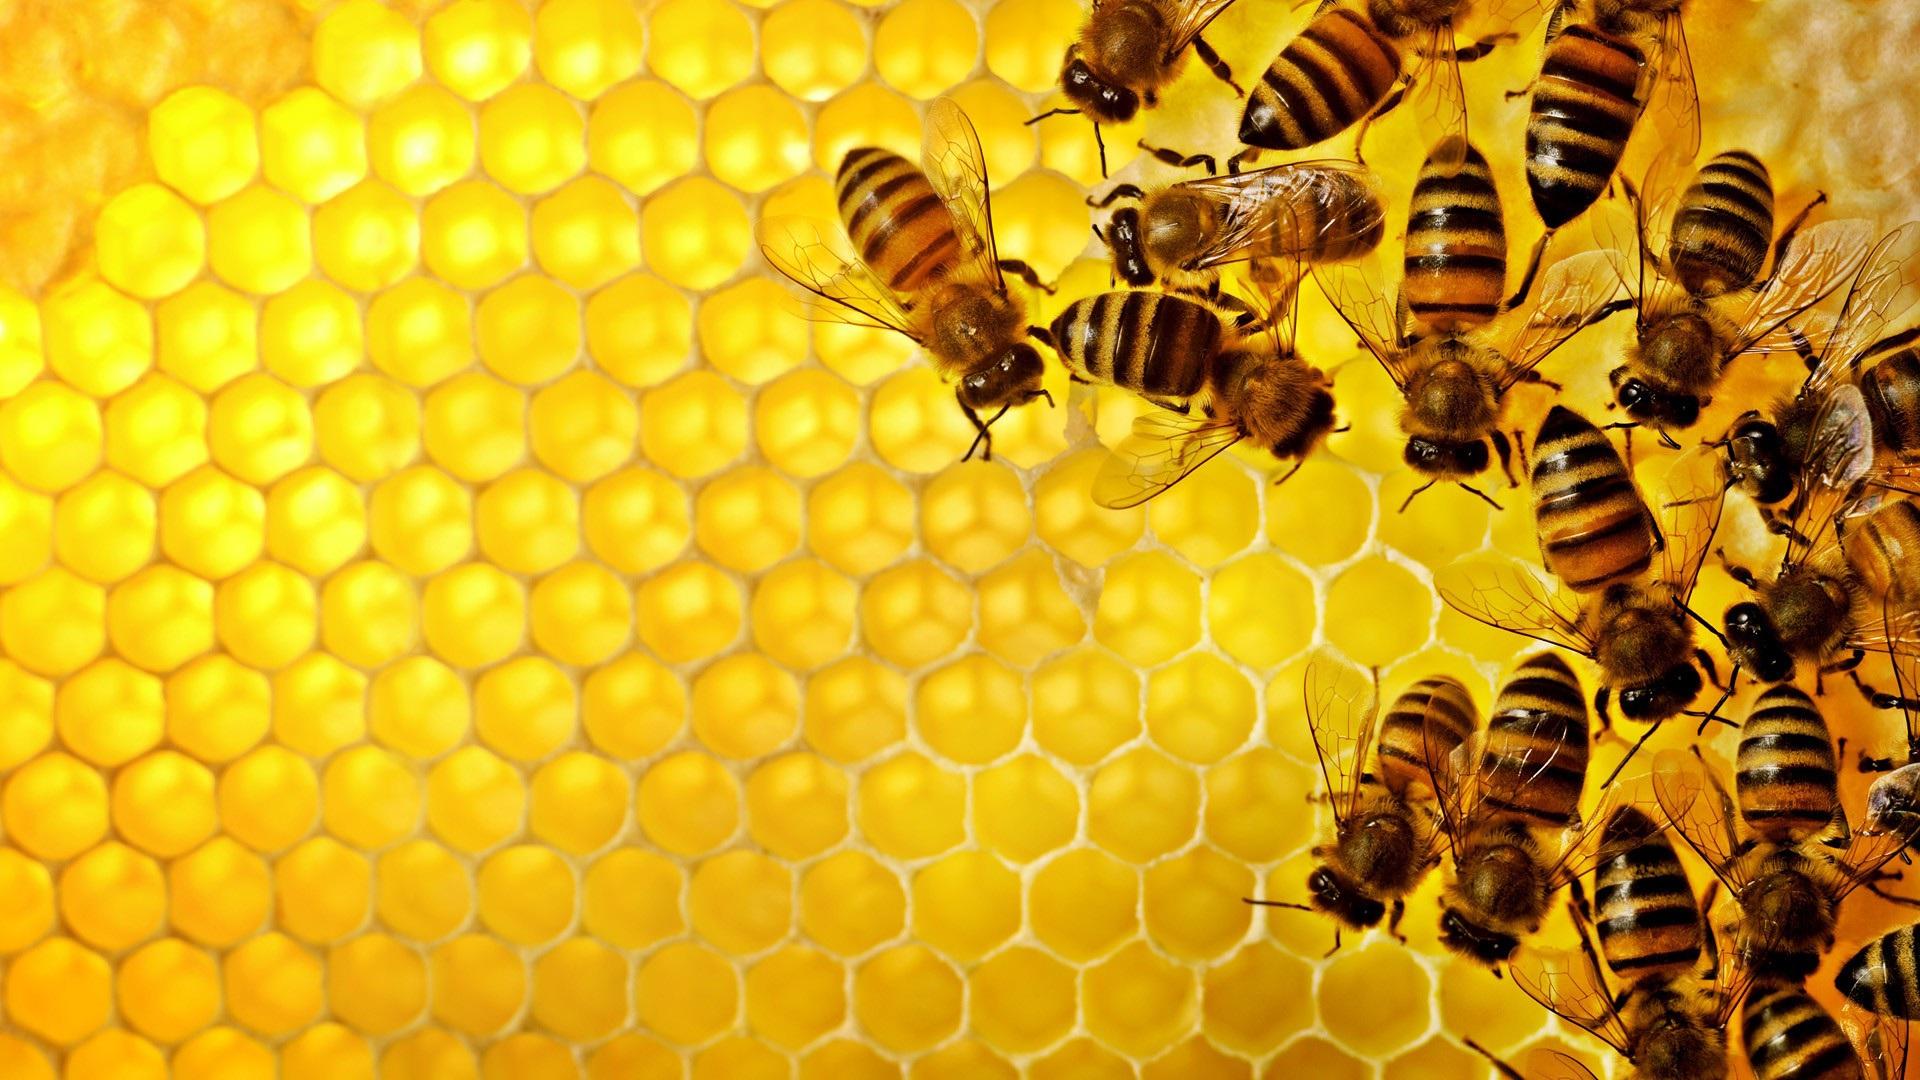 honey bee movie wallpaper